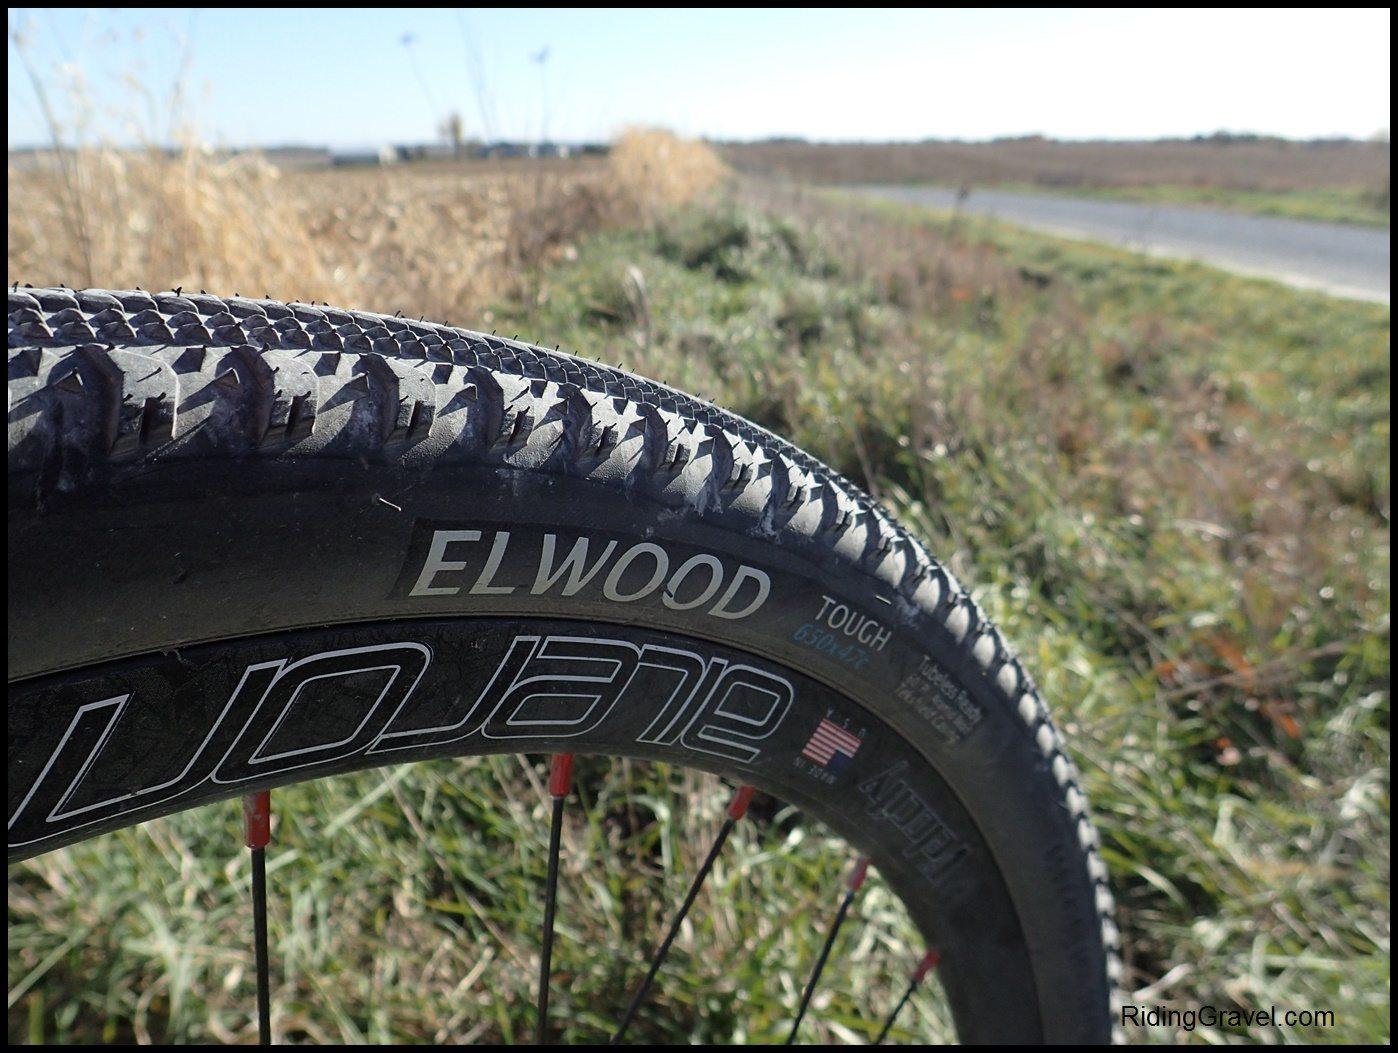 Terrene Tires Elwood: Checkpoint #2